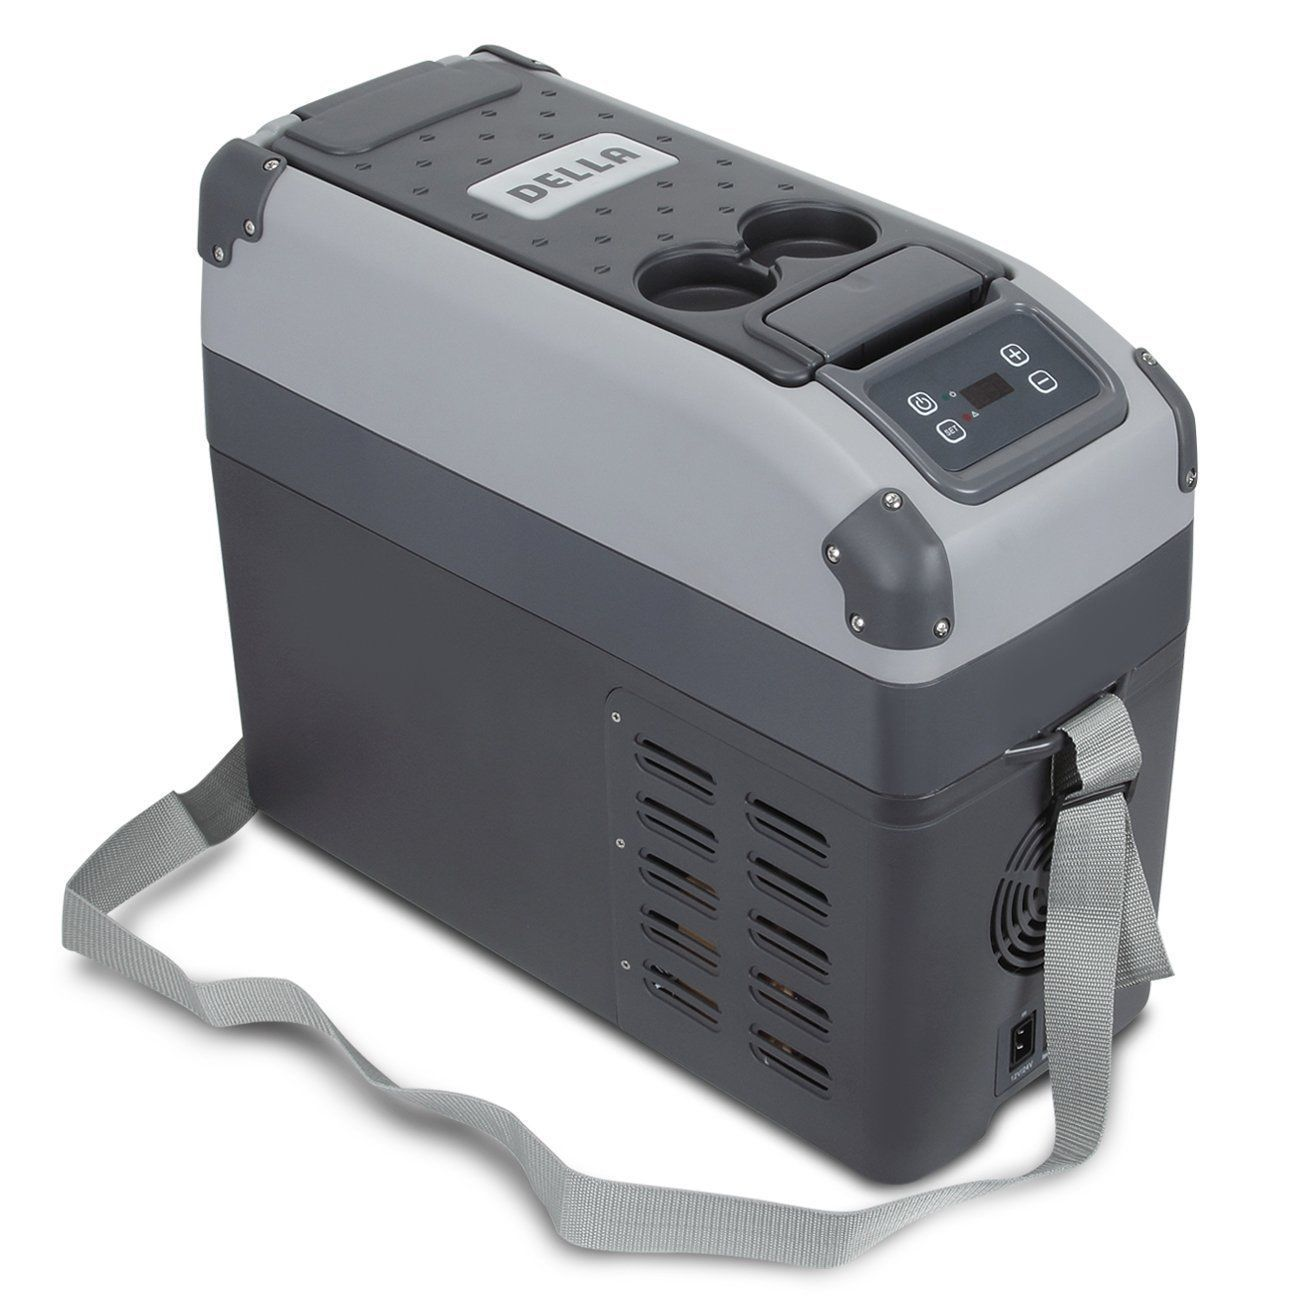 Della 16l Portable Refrigerator 12v Freezer Cooler Electric Ac Dc Fridge Usb And Portable Refrigerator Usb Portable Fridge